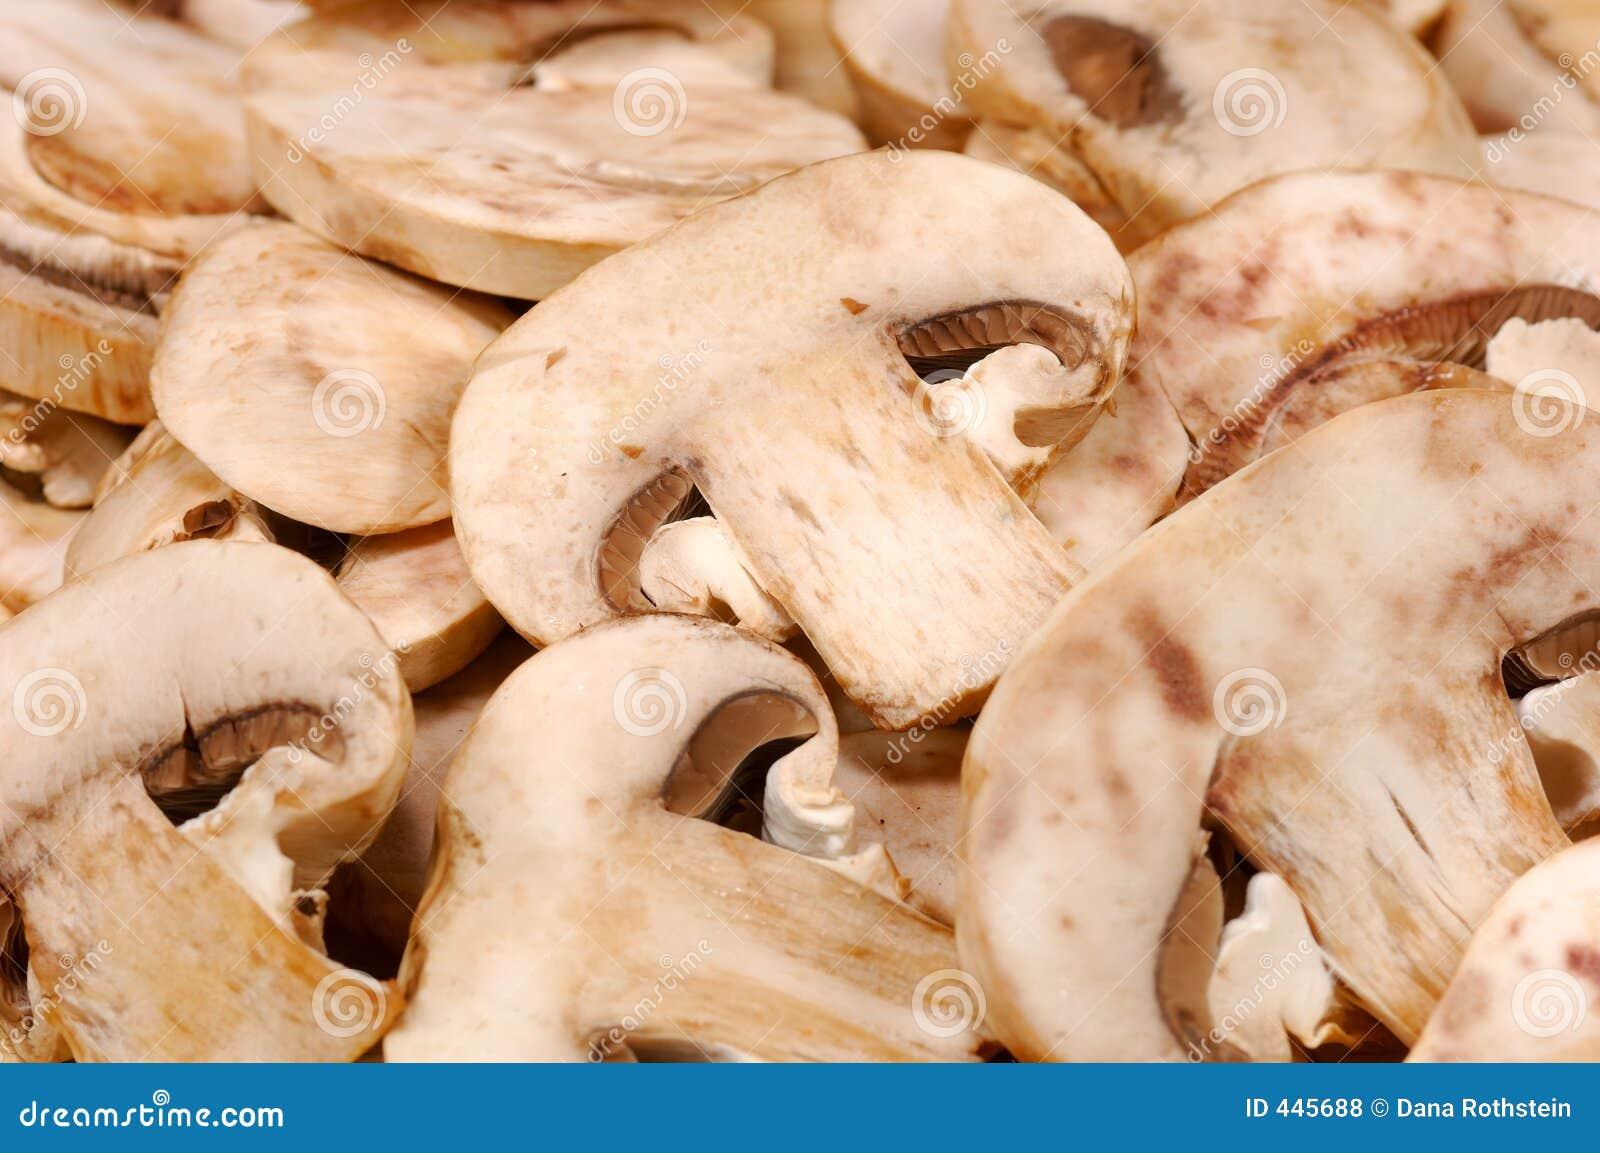 Sliced Mushrooms Royalty Free Stock Photos - Image: 445688